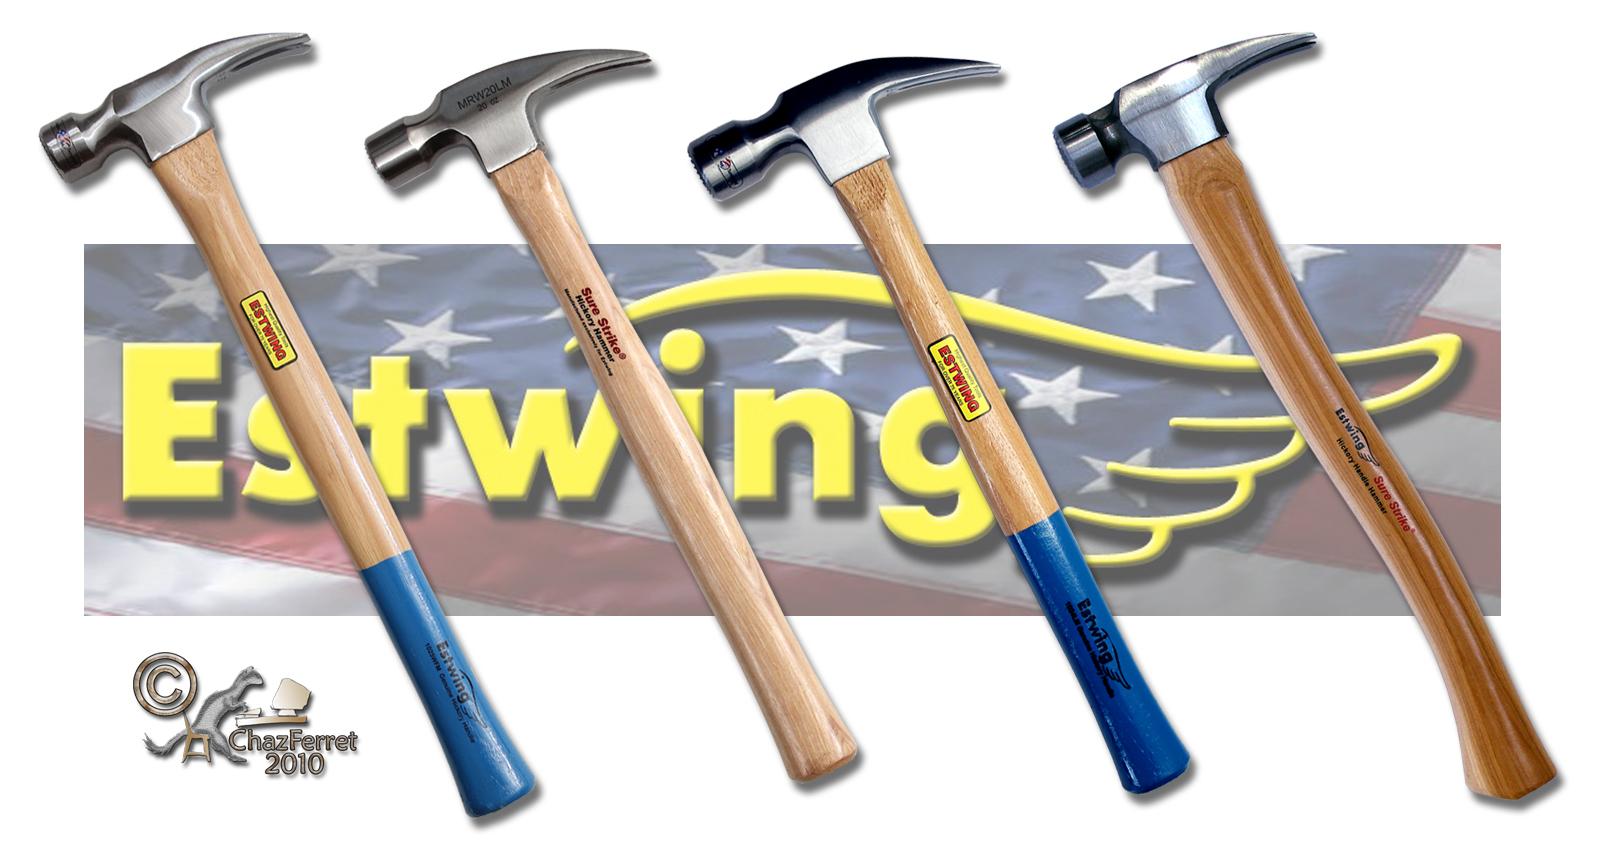 framing hammer collecting flickr - Estwing Framing Hammer